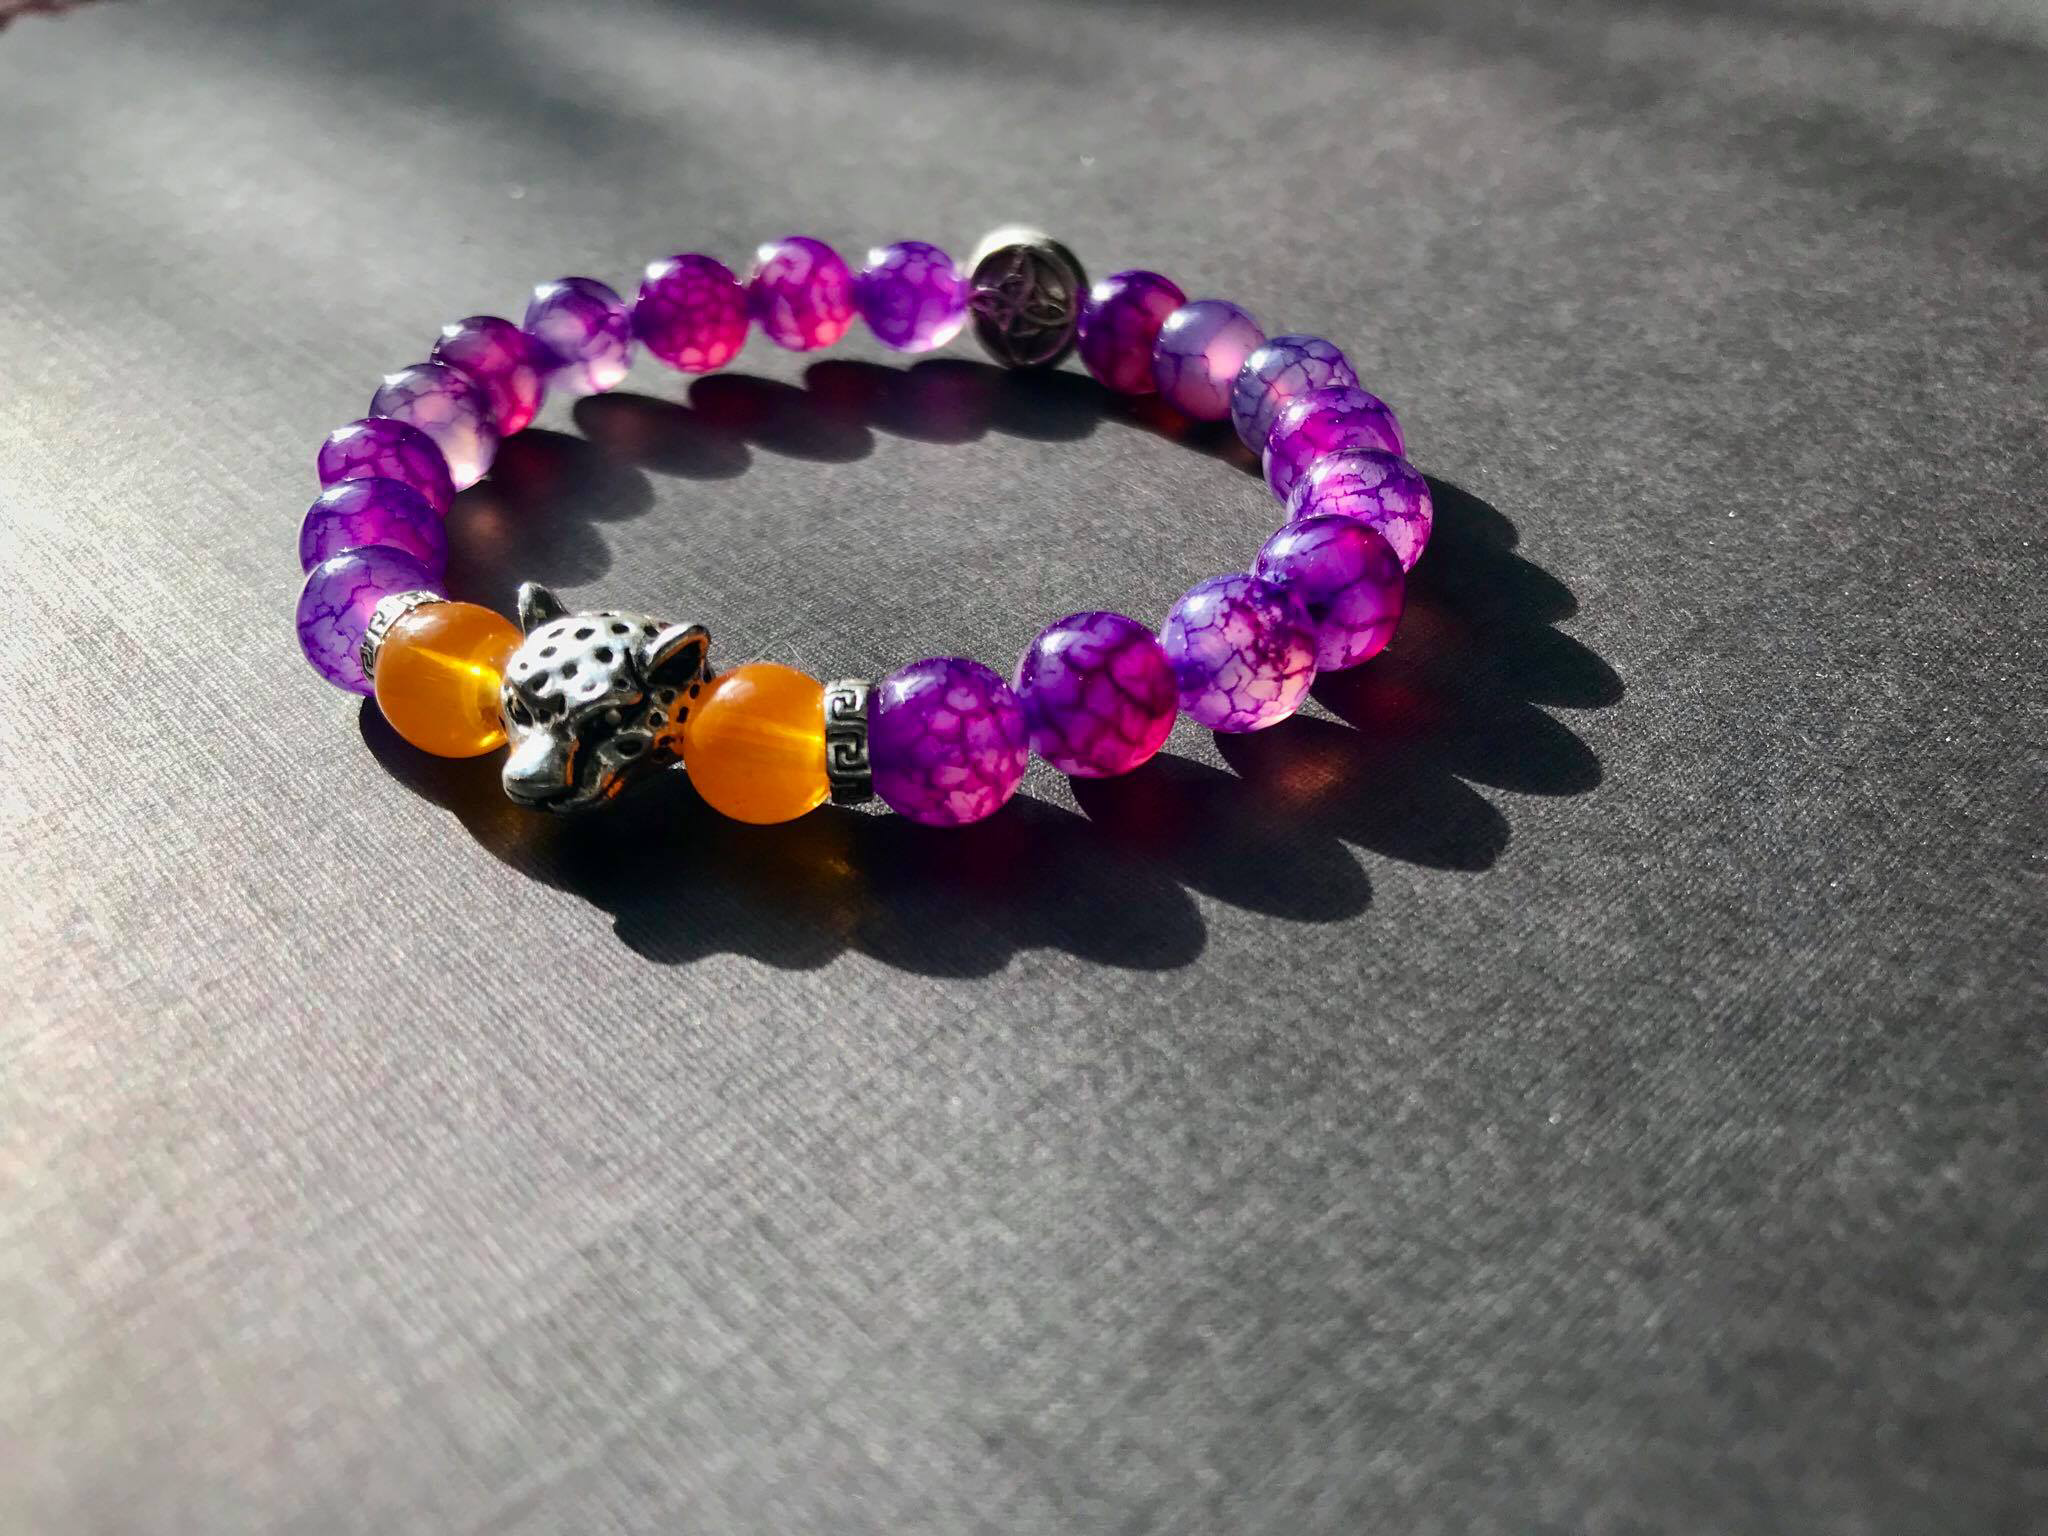 Unique handcrafted purple agate orange agate leopard head bead